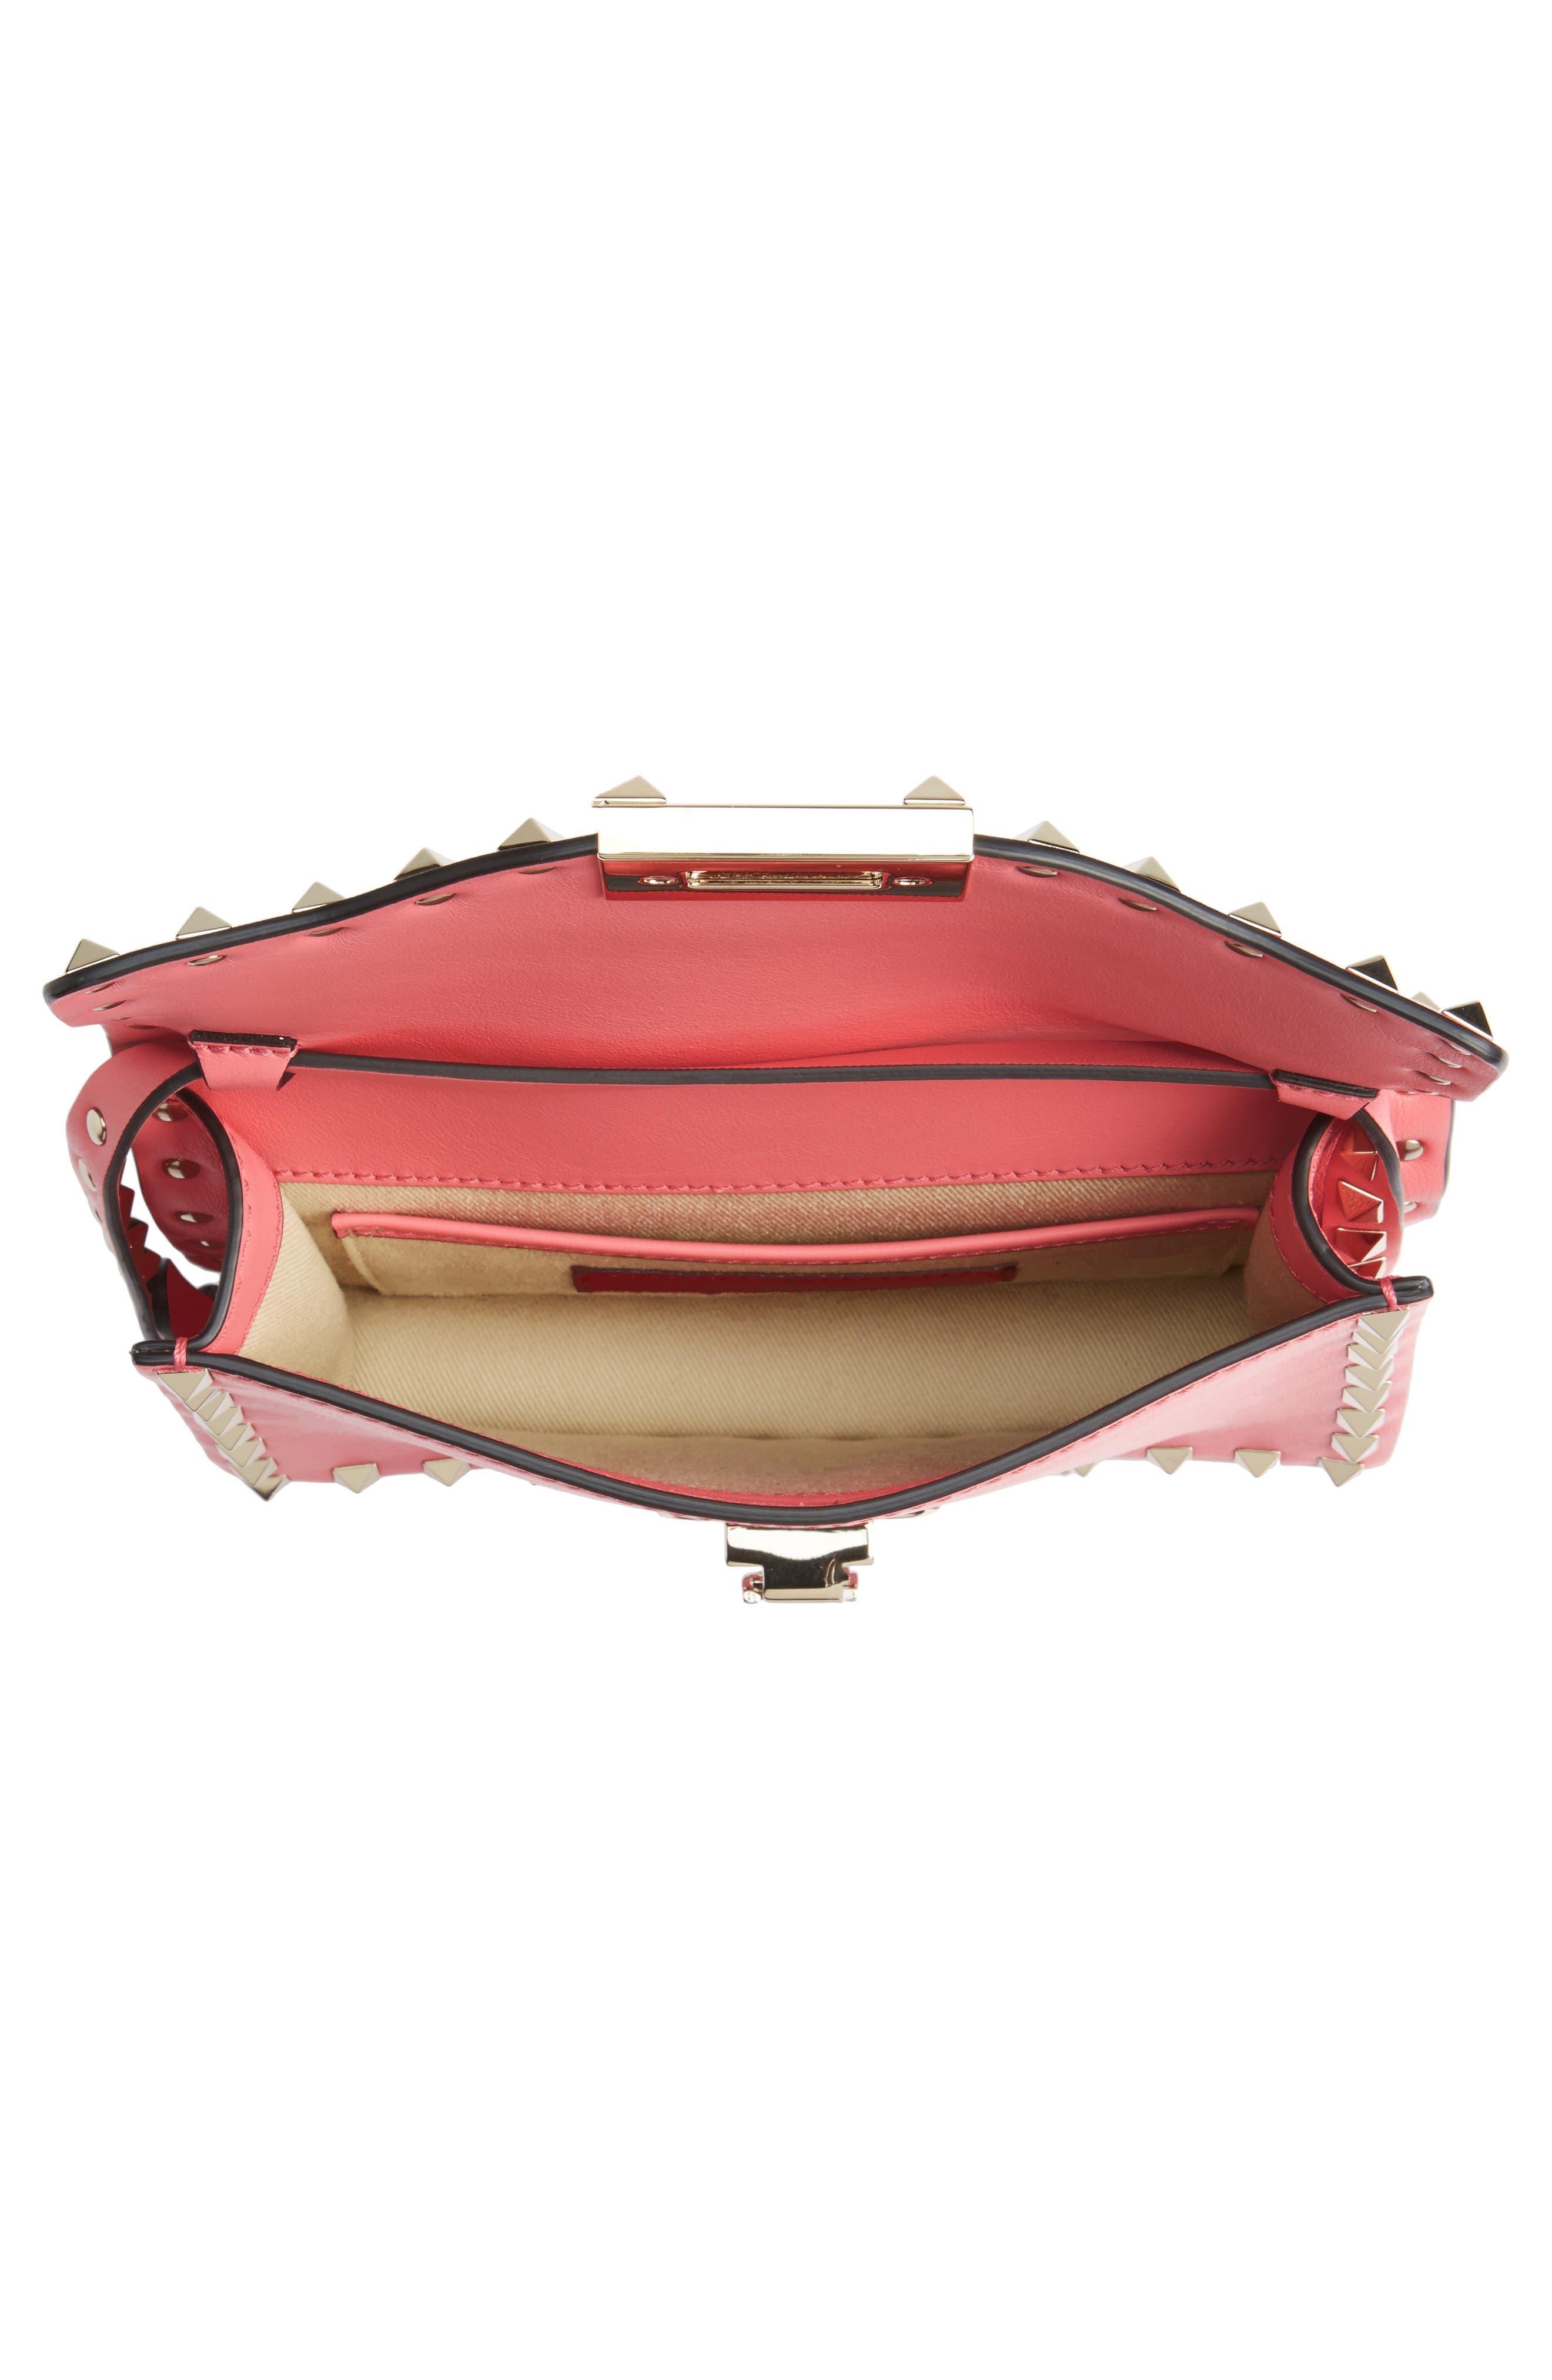 Rockstud Leather Crossbody Bag,                             Alternate thumbnail 3, color,                             Antique Rose